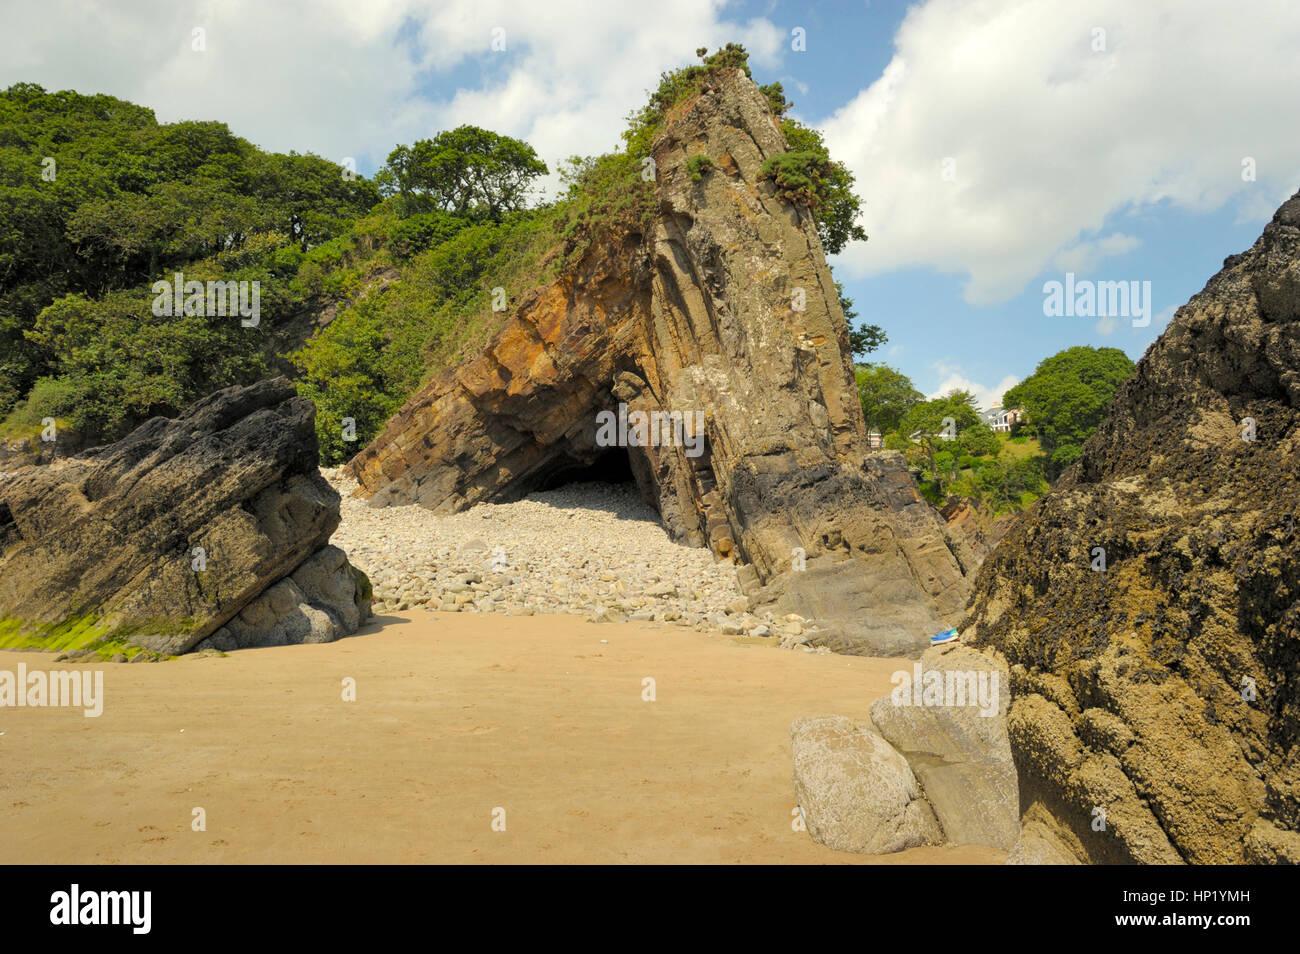 Saundersfoot Beach and Rocks - Stock Image